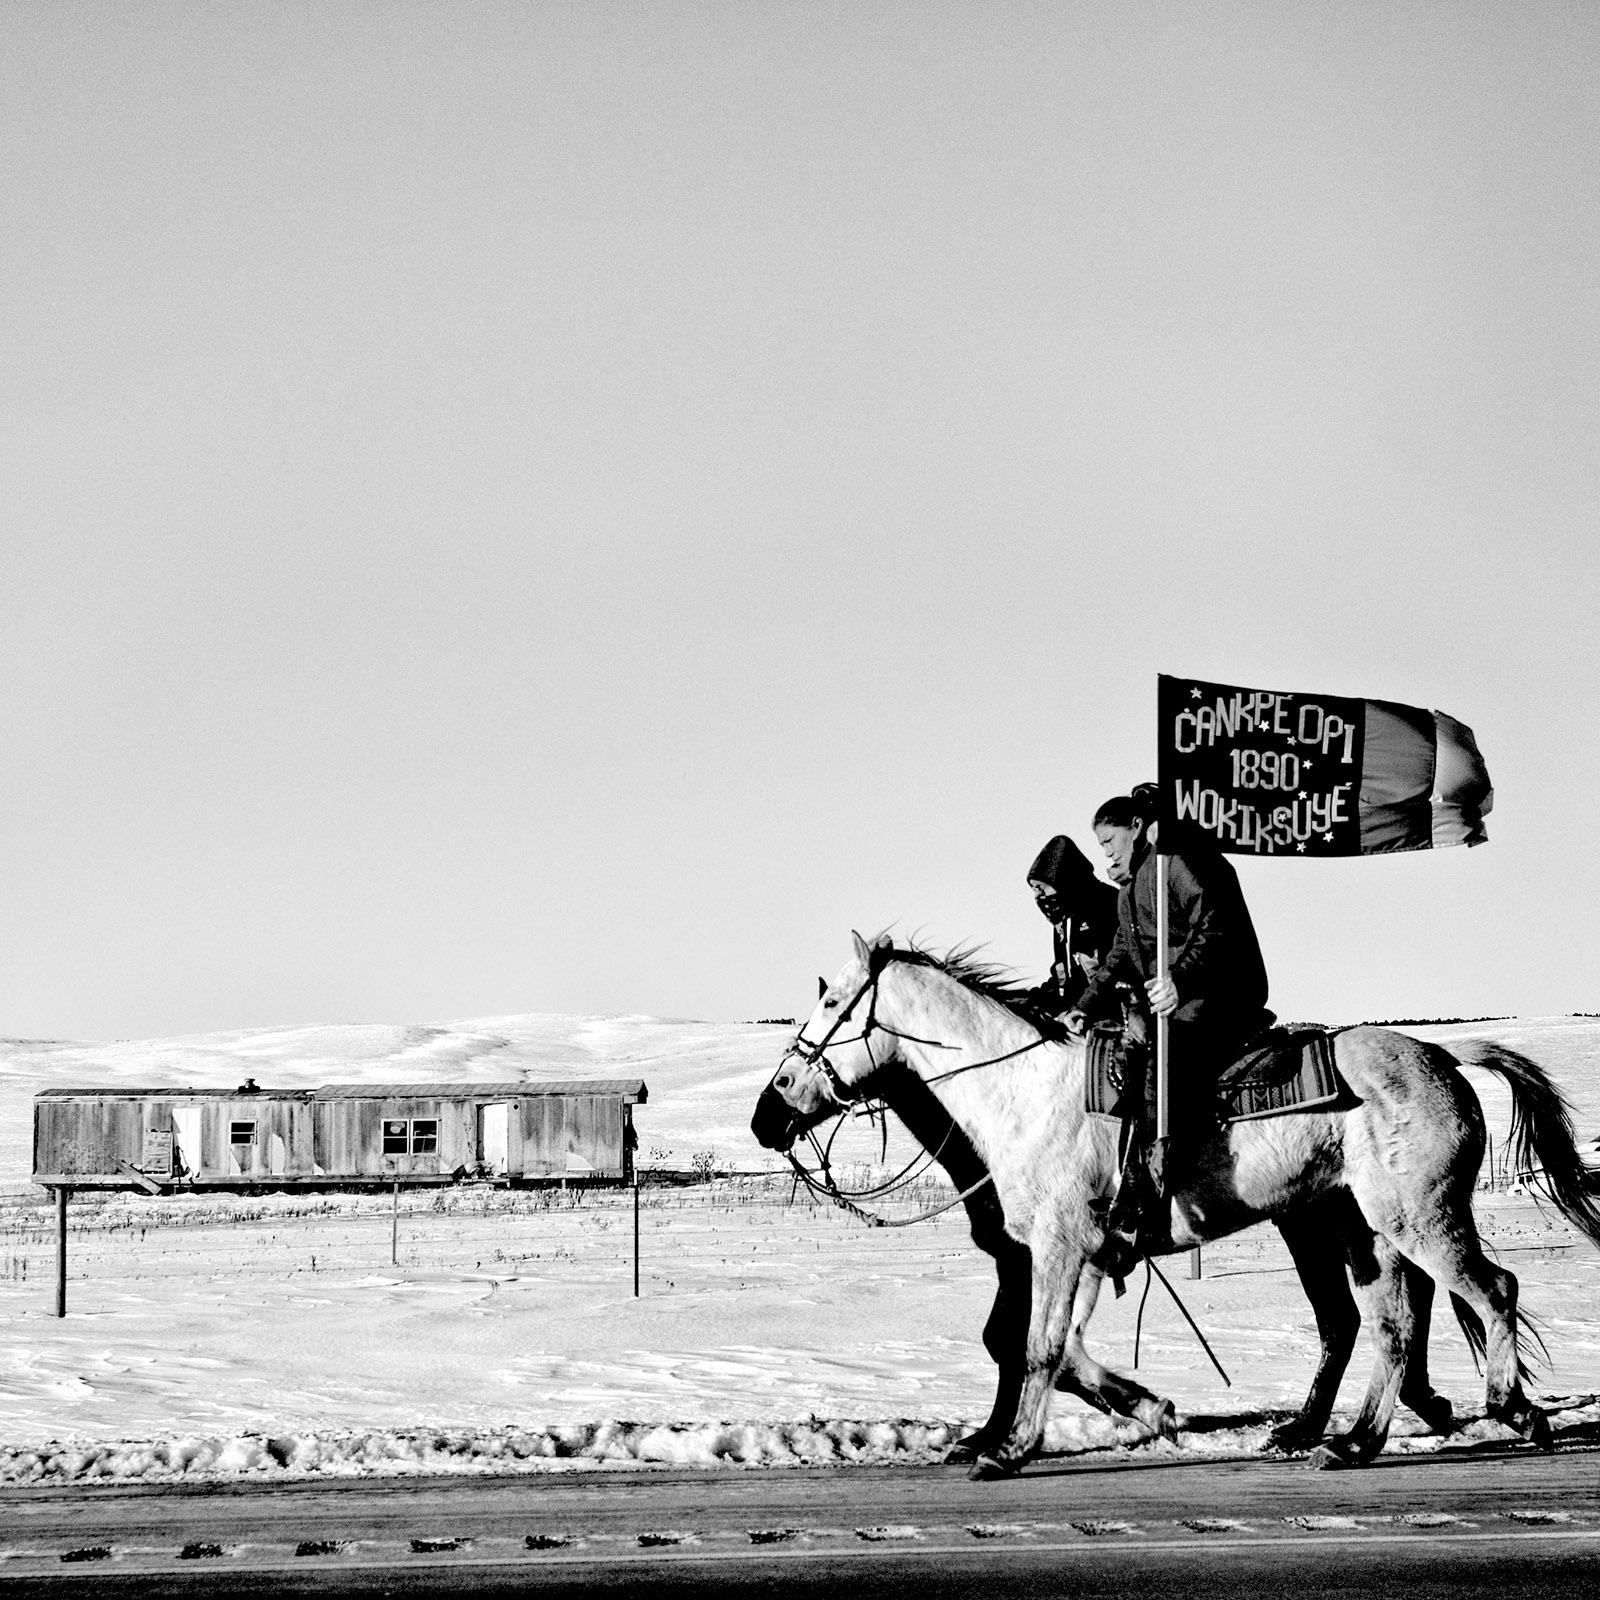 A commemoration of the Wounded Knee massacre, Pine Ridge, South Dakota, 2016